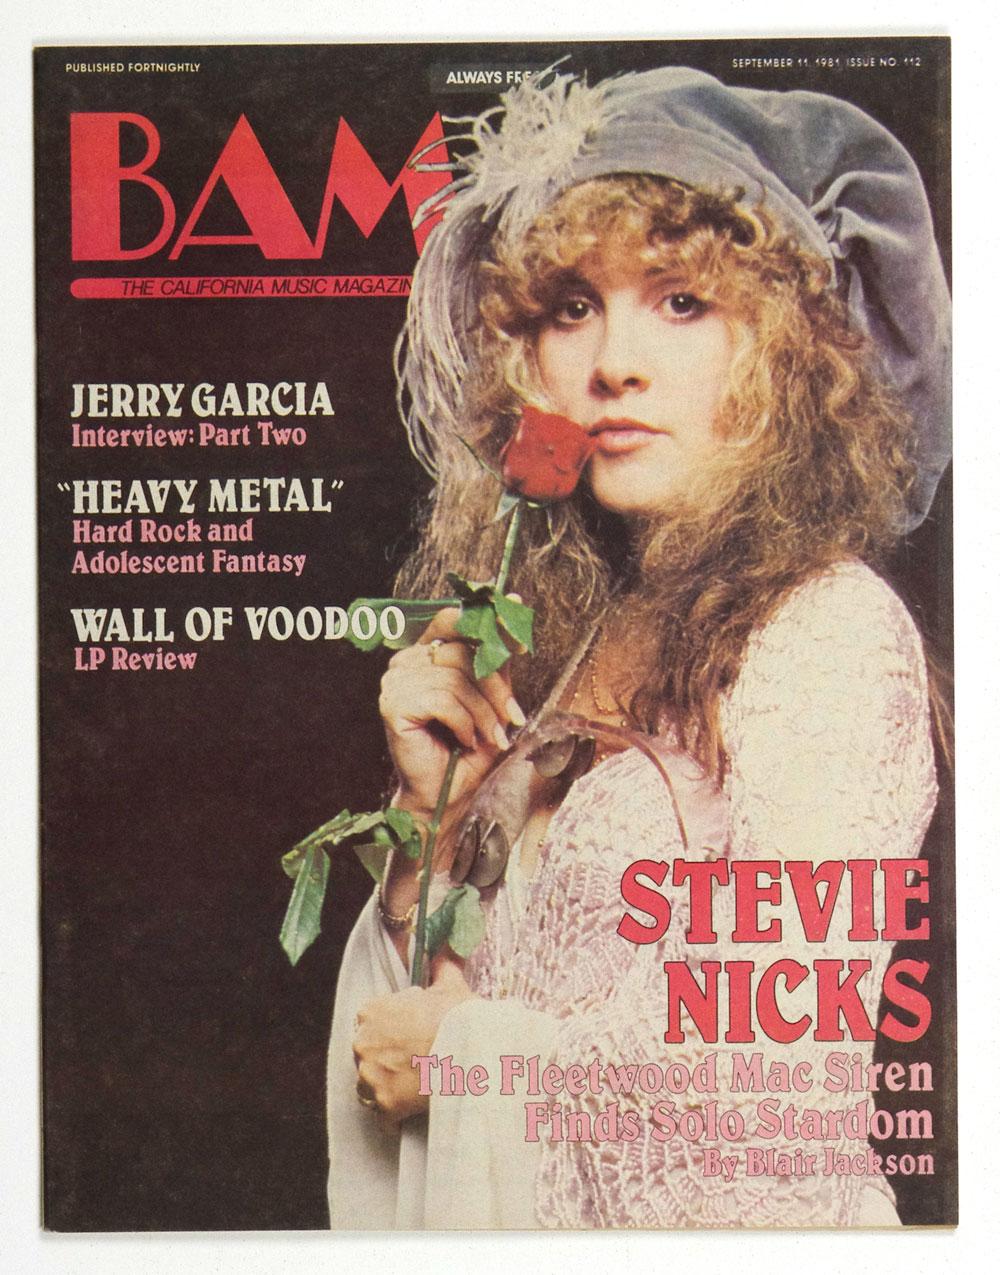 Stevie Nicks Magazine Back Issue BAM 1981 Sep 11 Jerry Garcia Interview